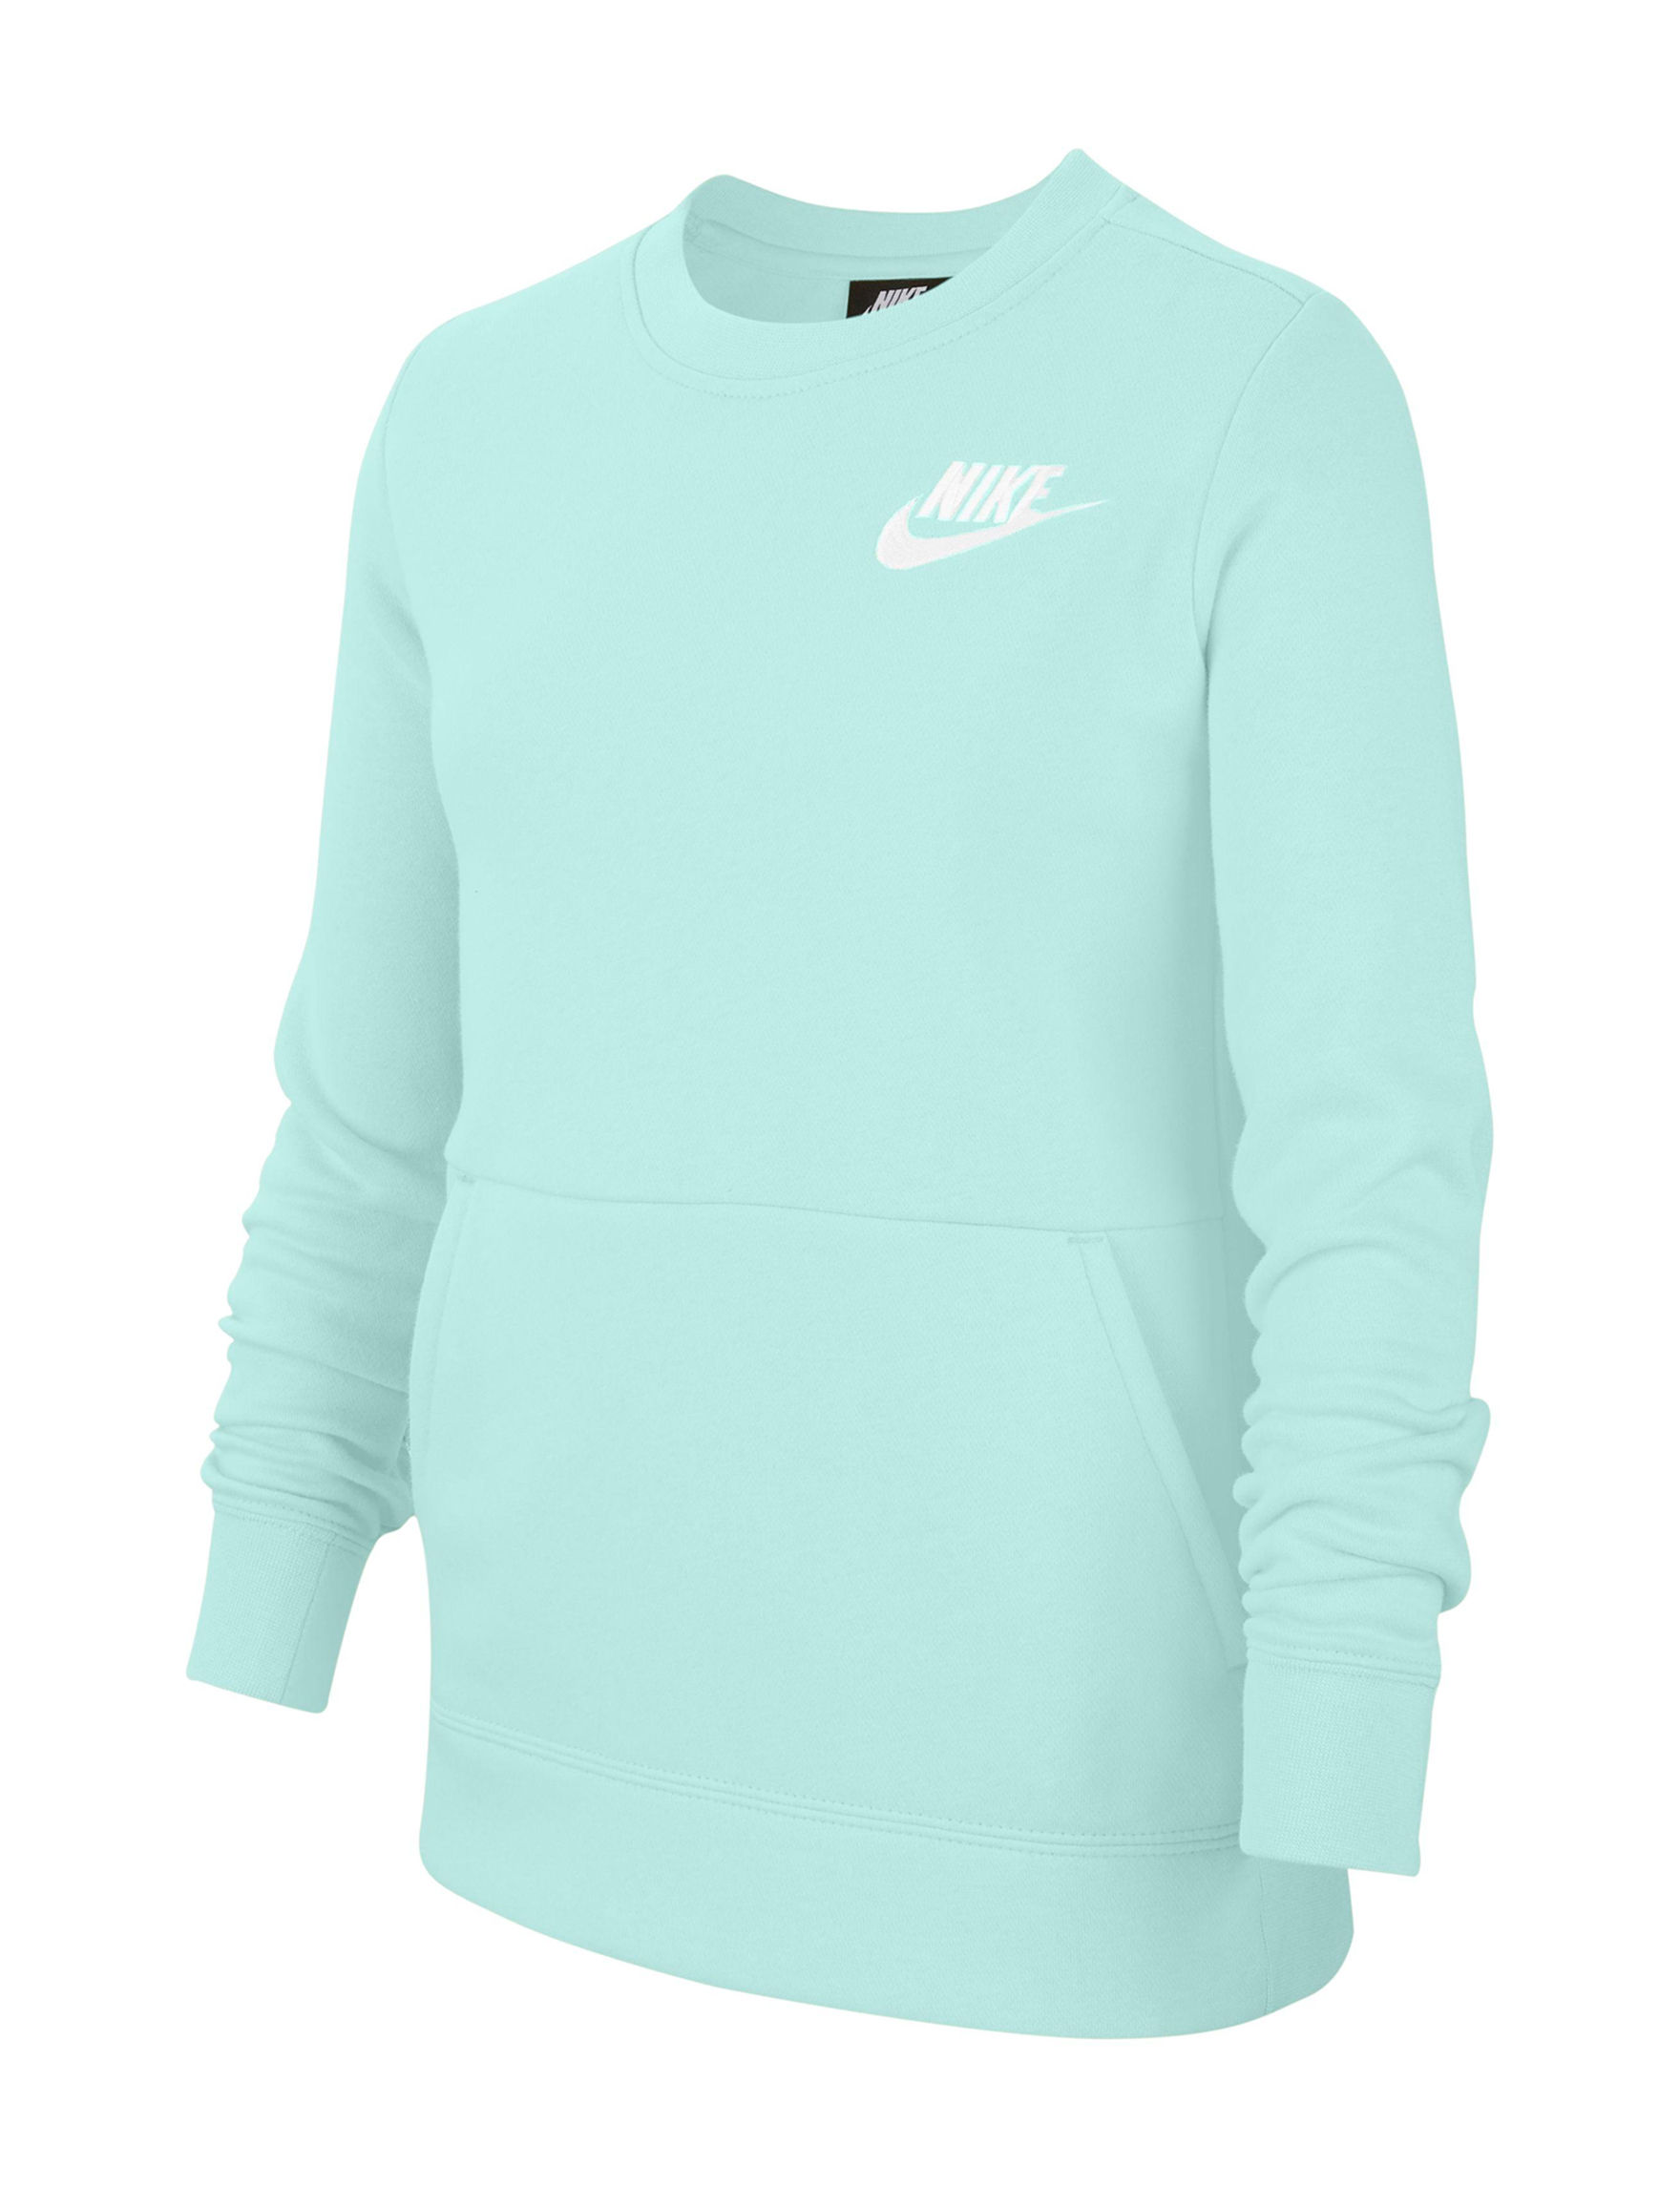 Nike Teal / White